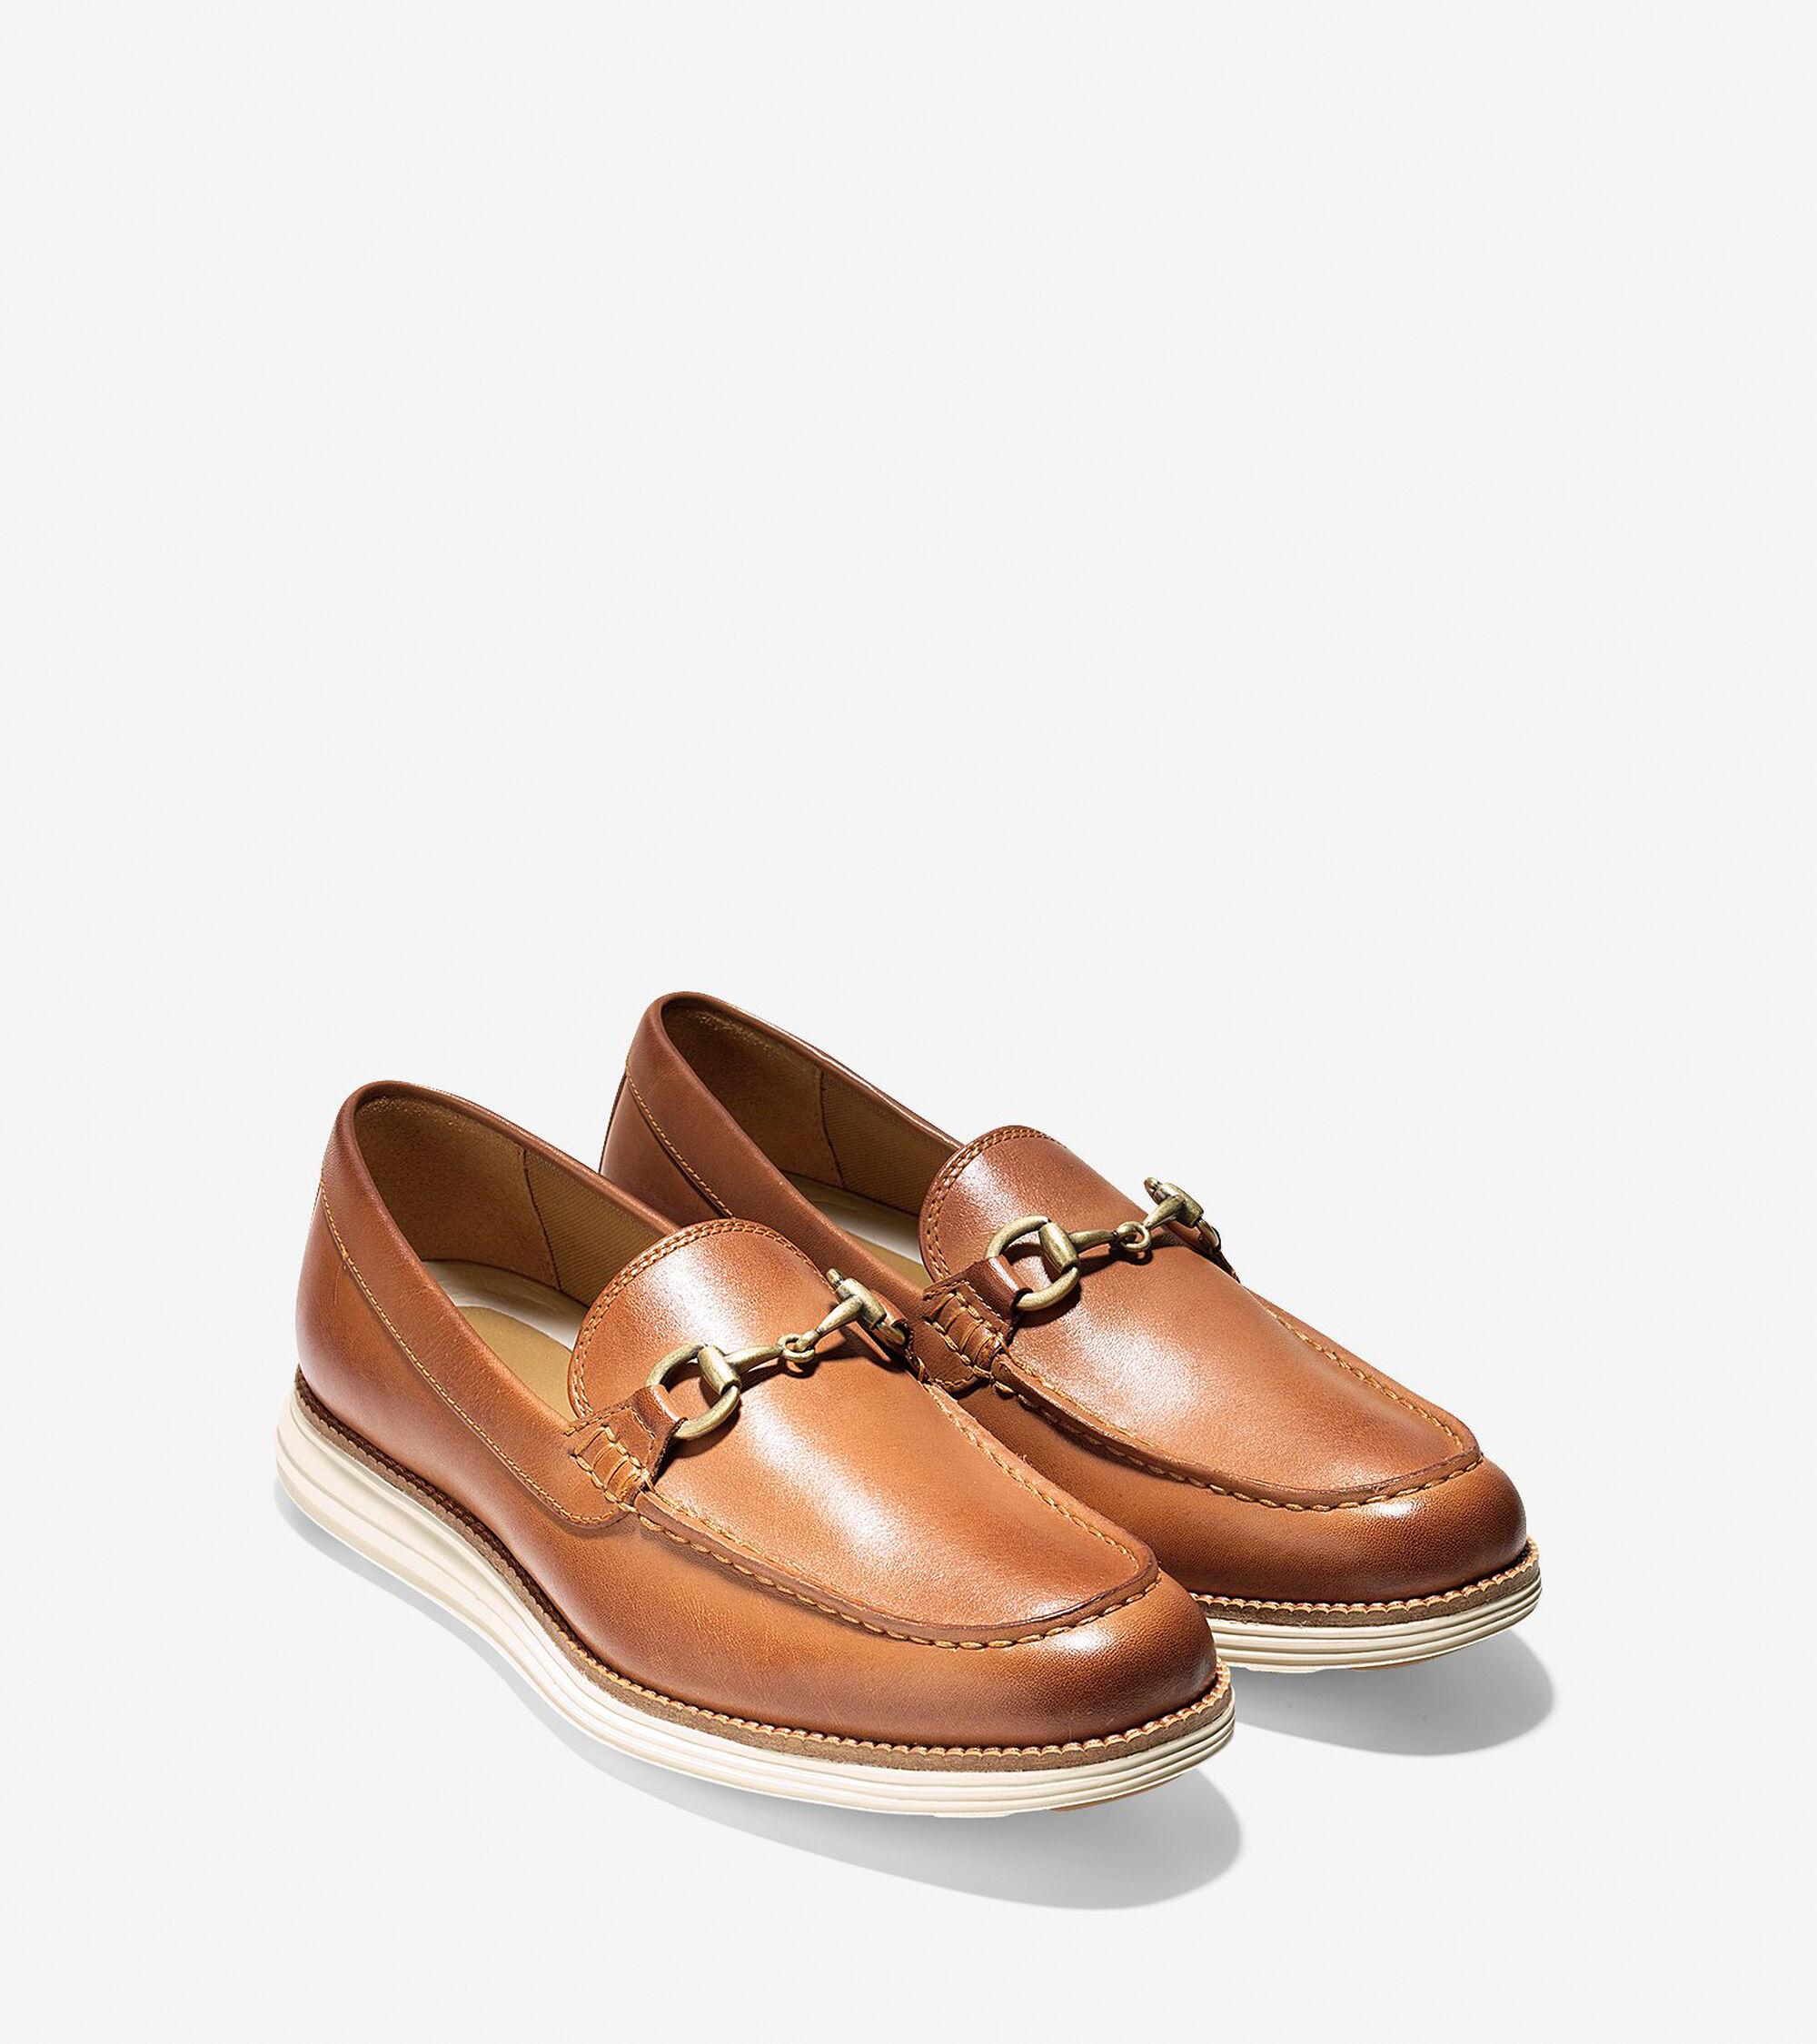 08ee6c596f3af Original Grand Venetian Loafers in Pecan-Ivory